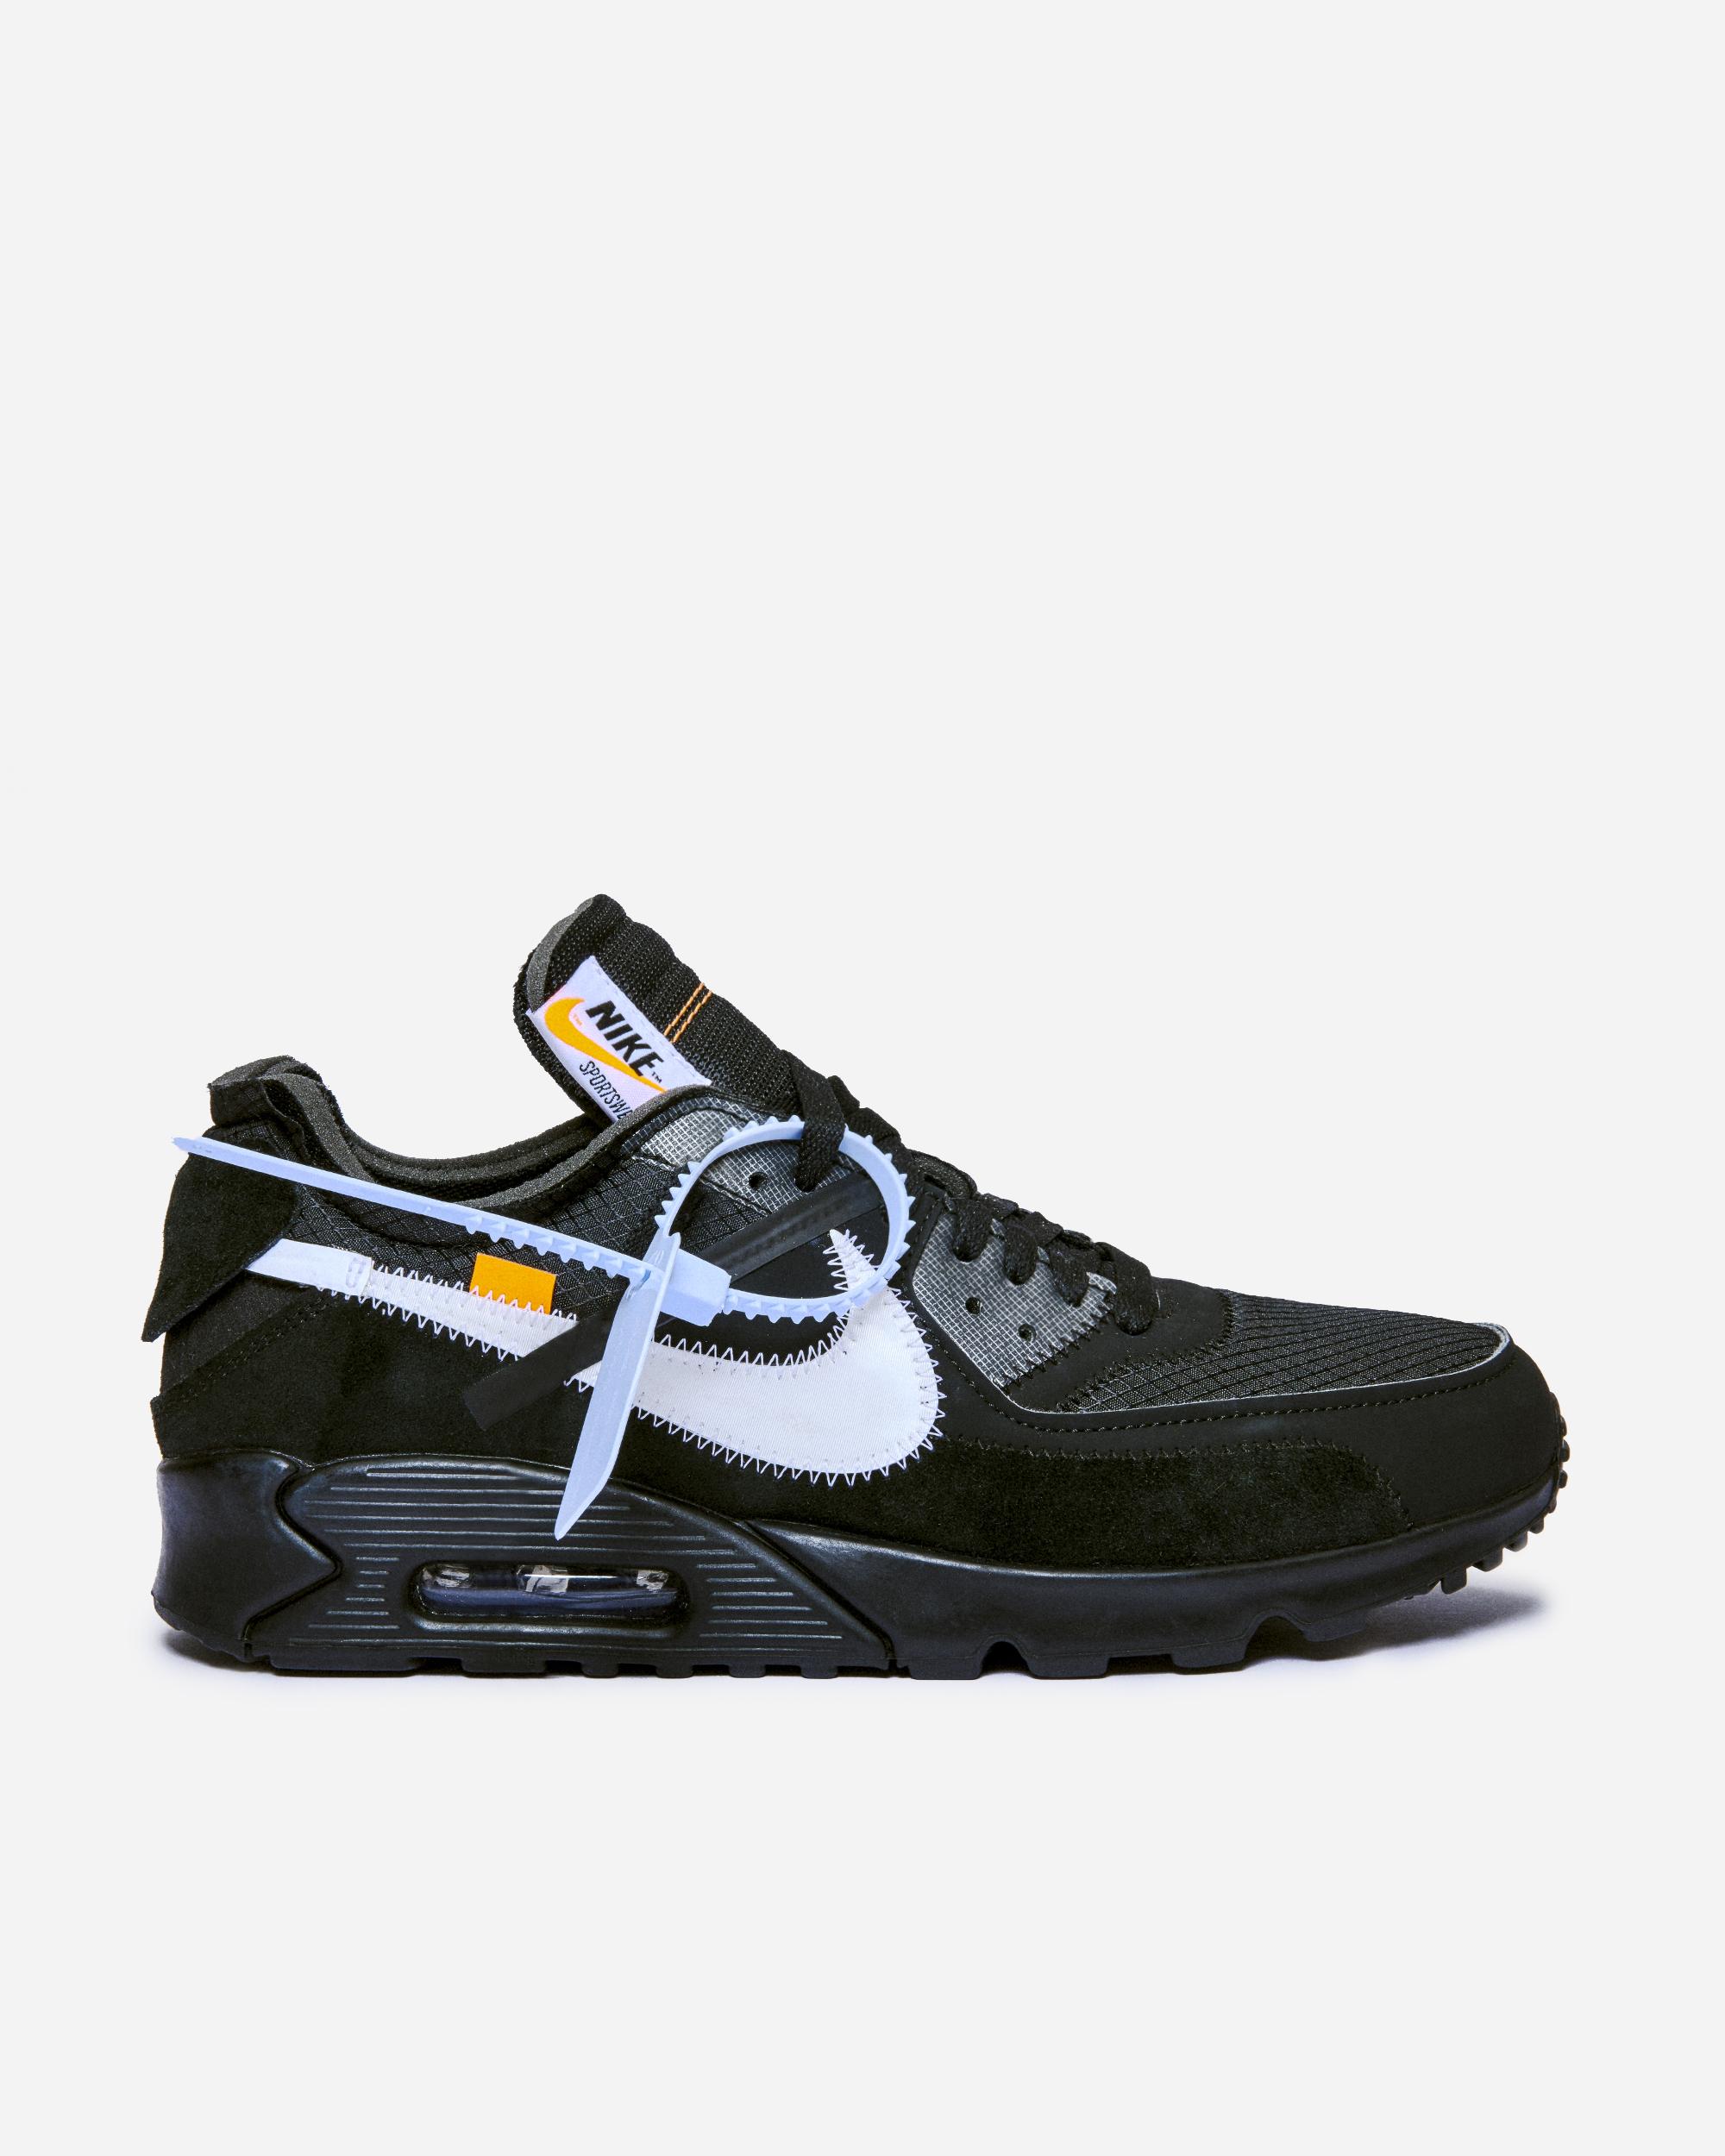 Nike Sportswear NikeLab x Off White Air Max 90 BlackBlack